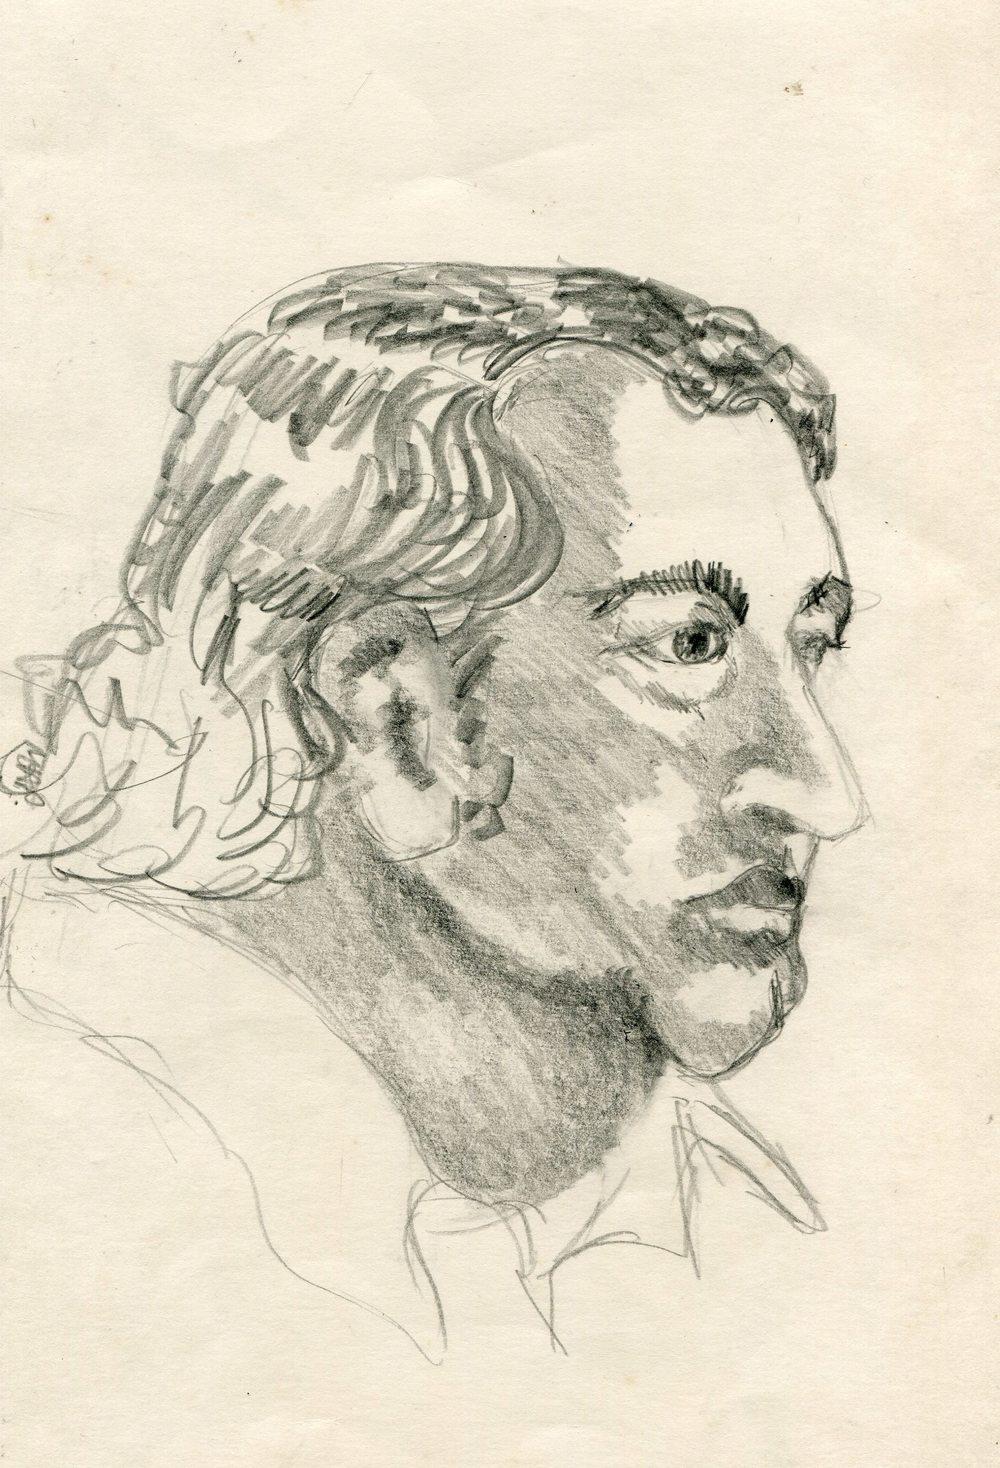 80a Pattenden, Marilyn - Man's Head , Pencil on paper..jpg